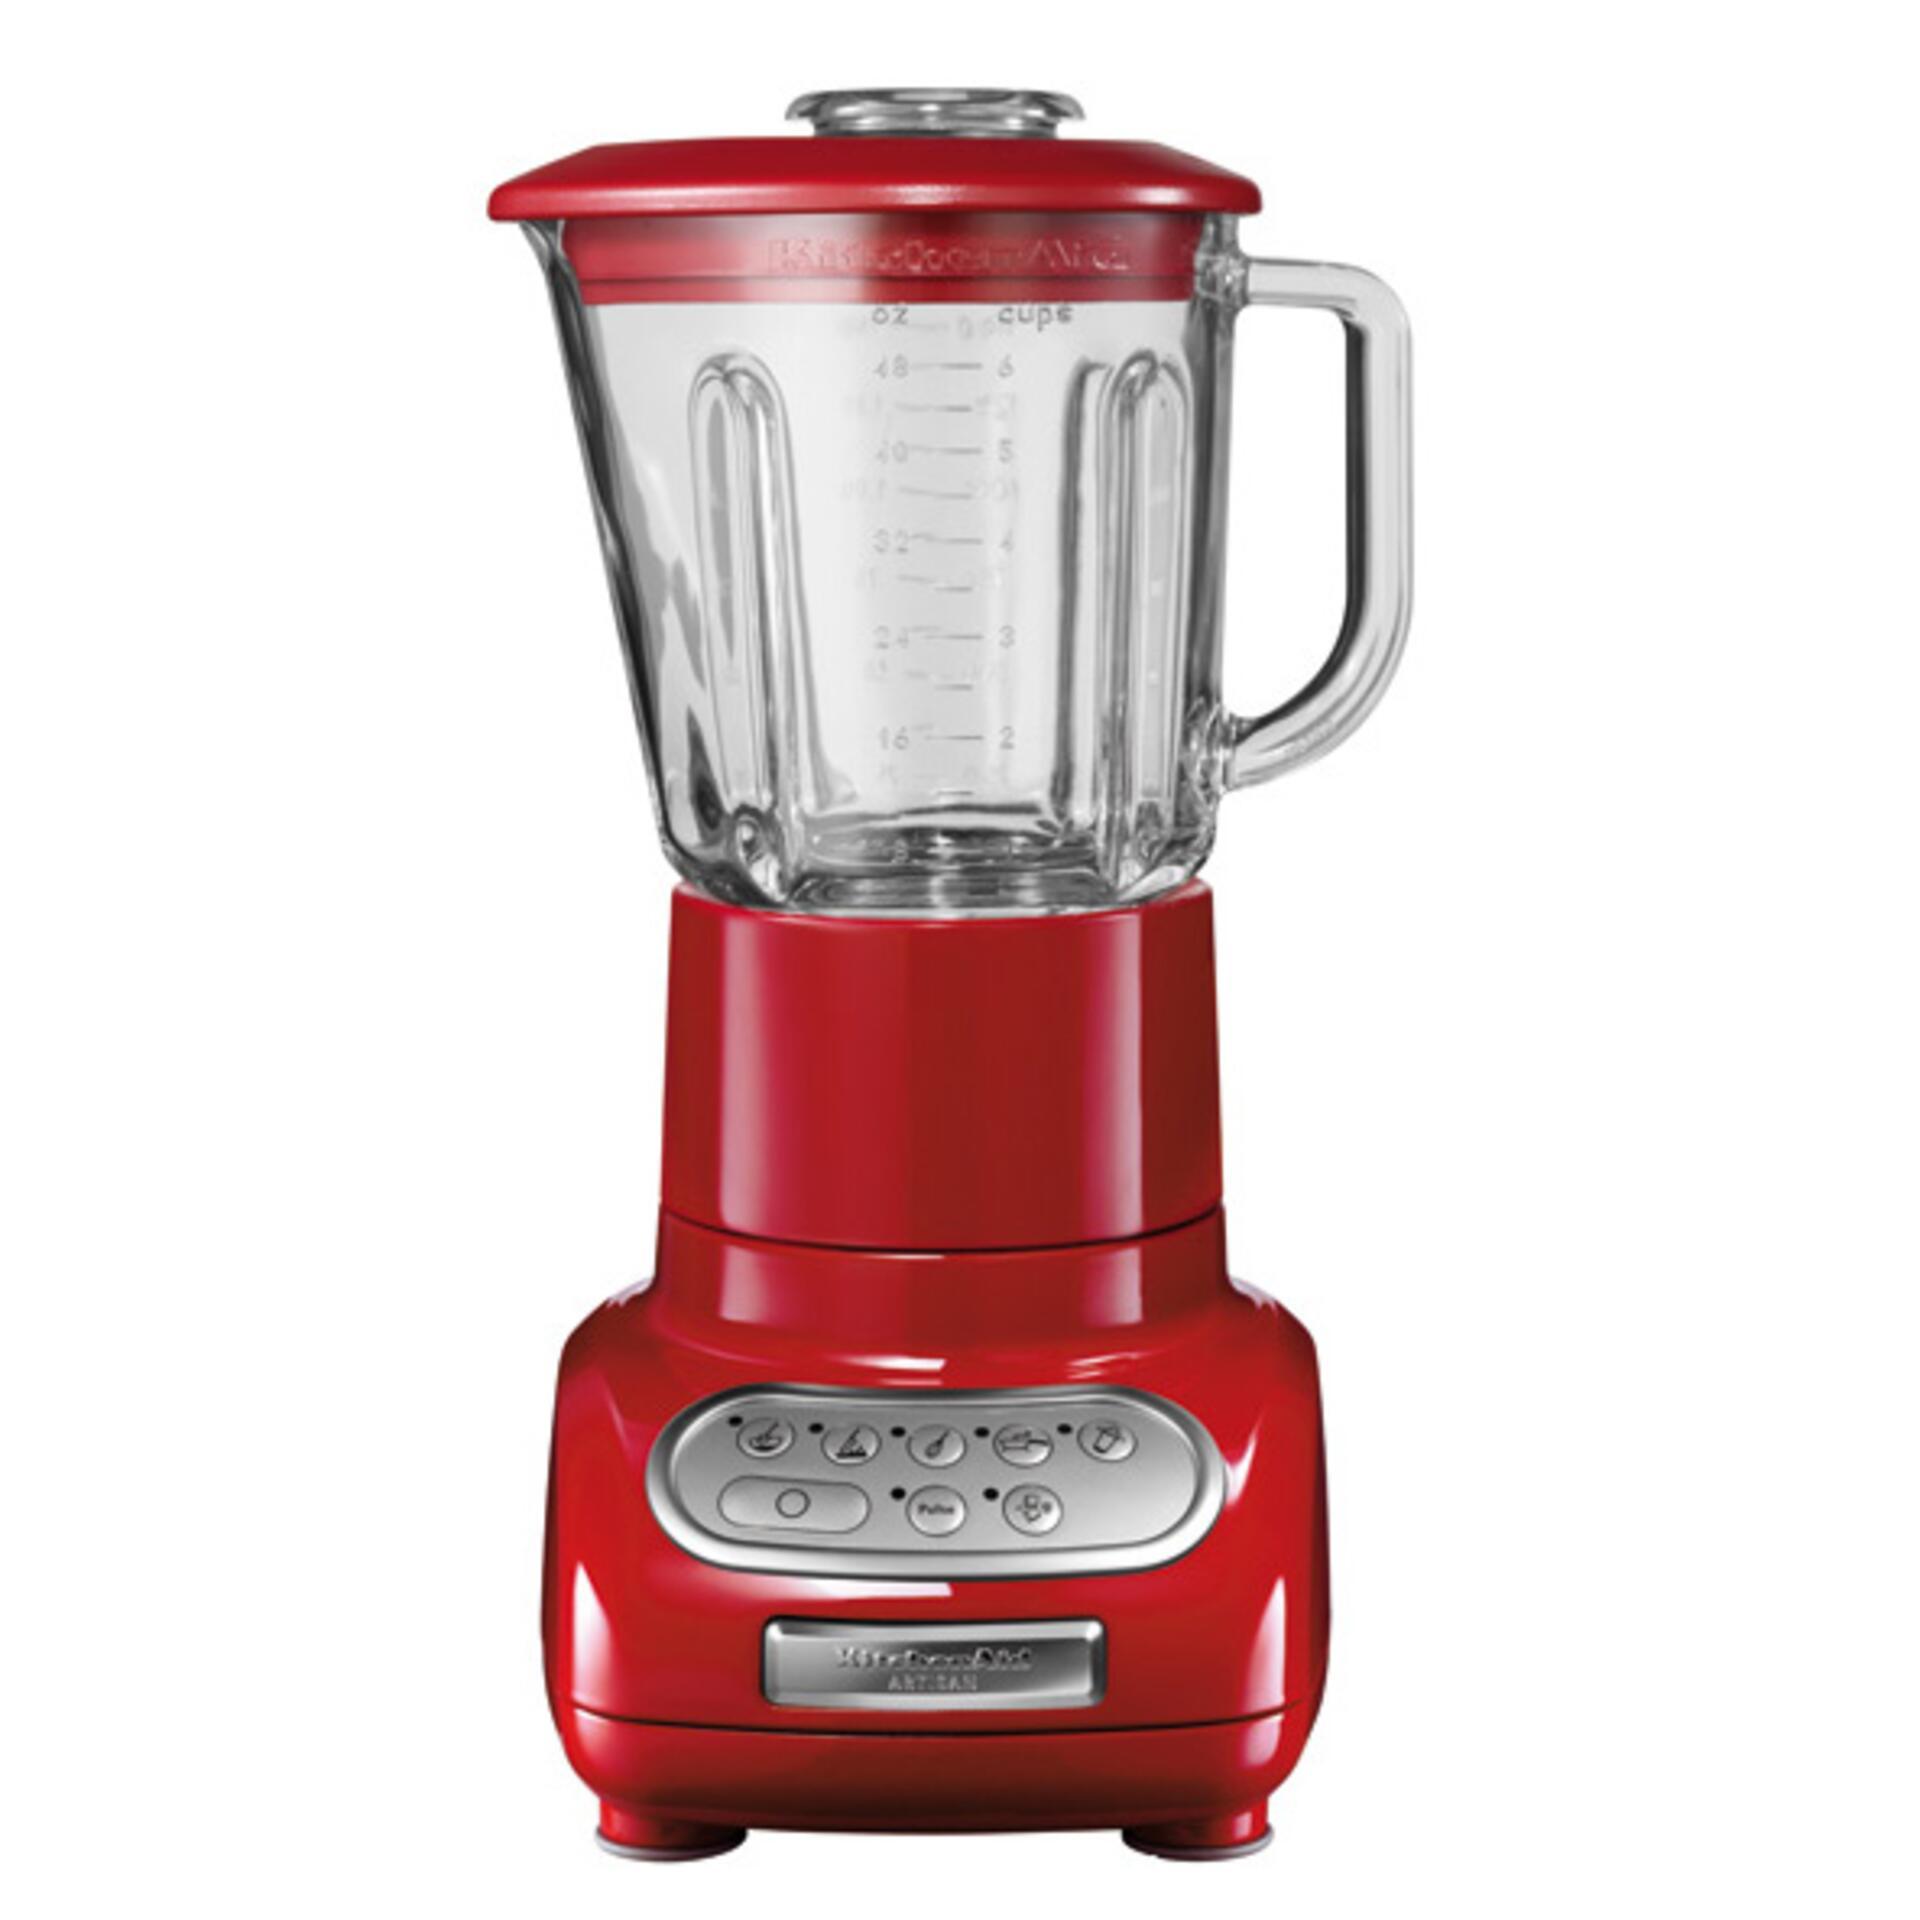 Kitchenaid Standmixer 5KSB5553EER Empire Red